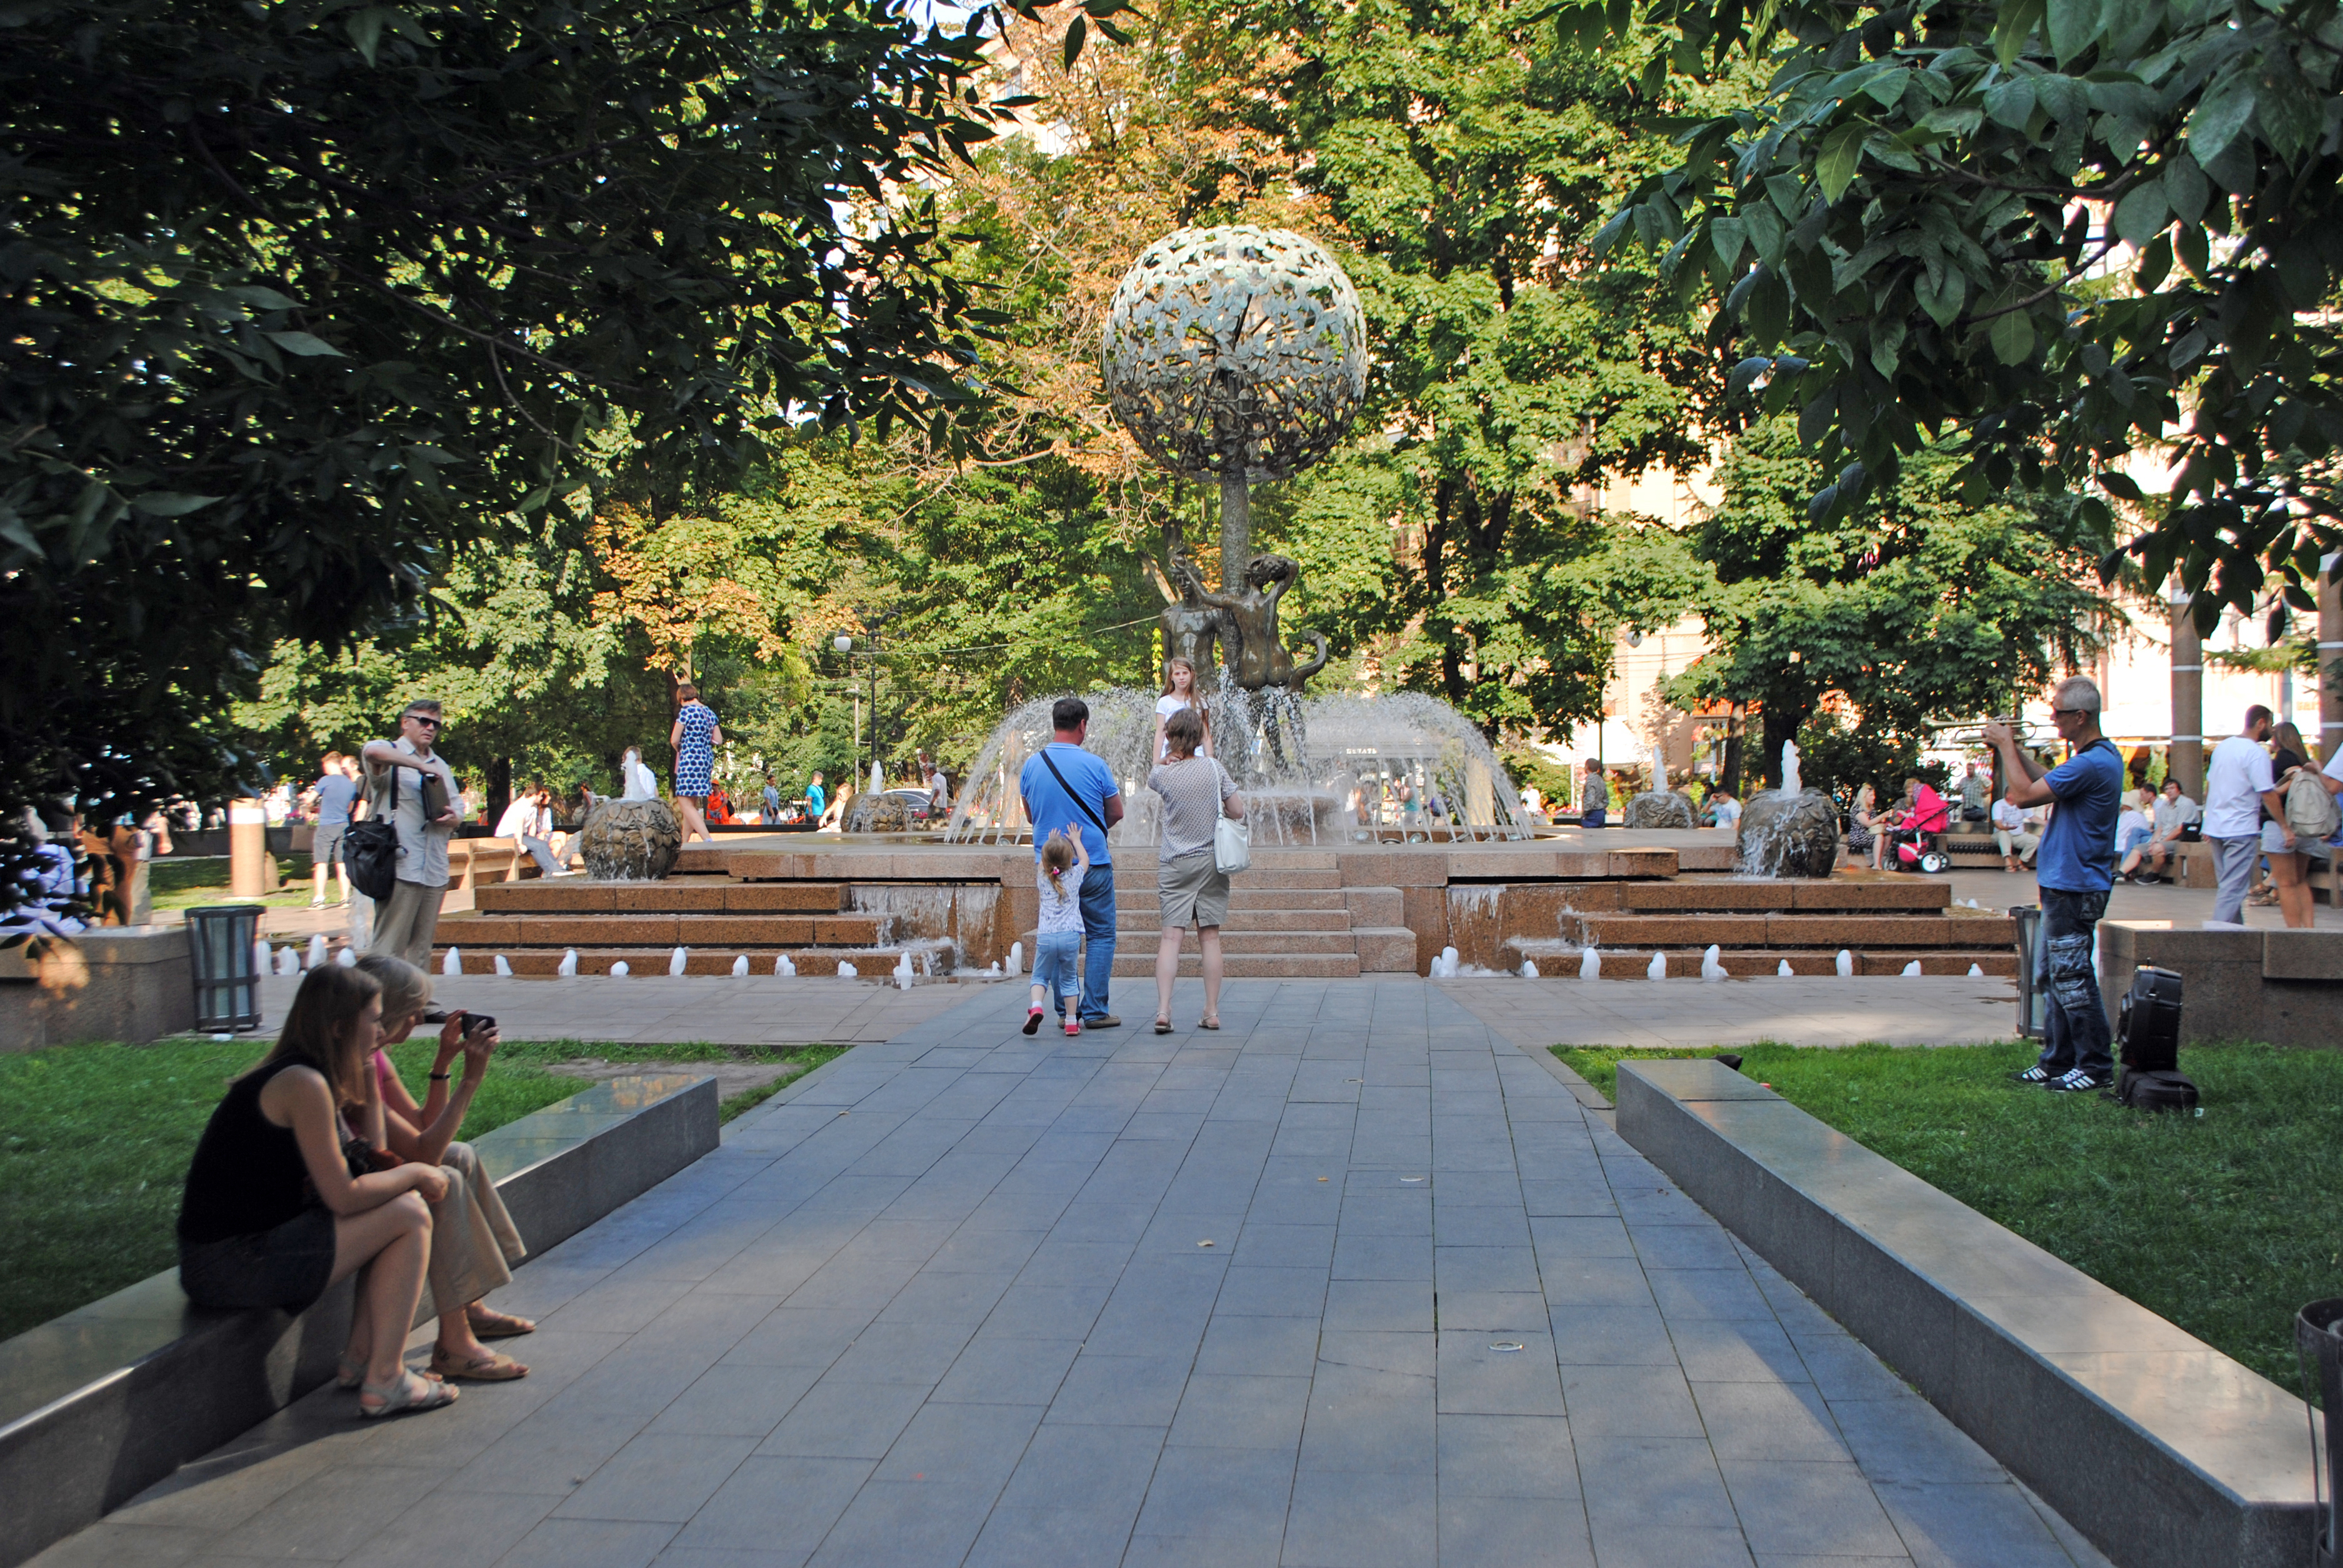 ::City Fountain